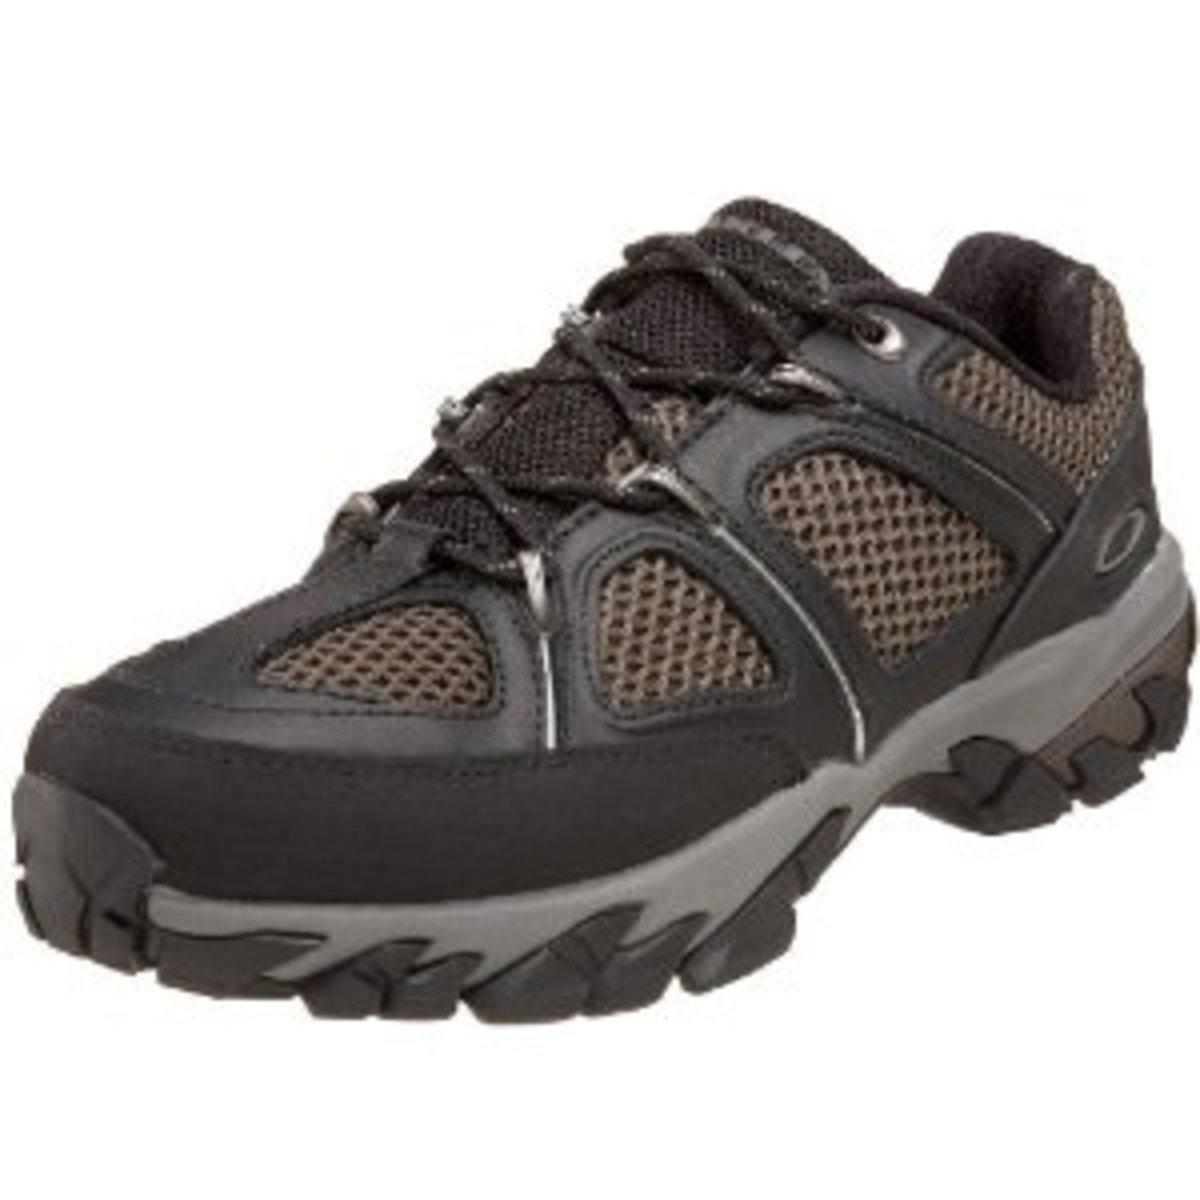 Oakley Men's Nail Low Hiking Shoe